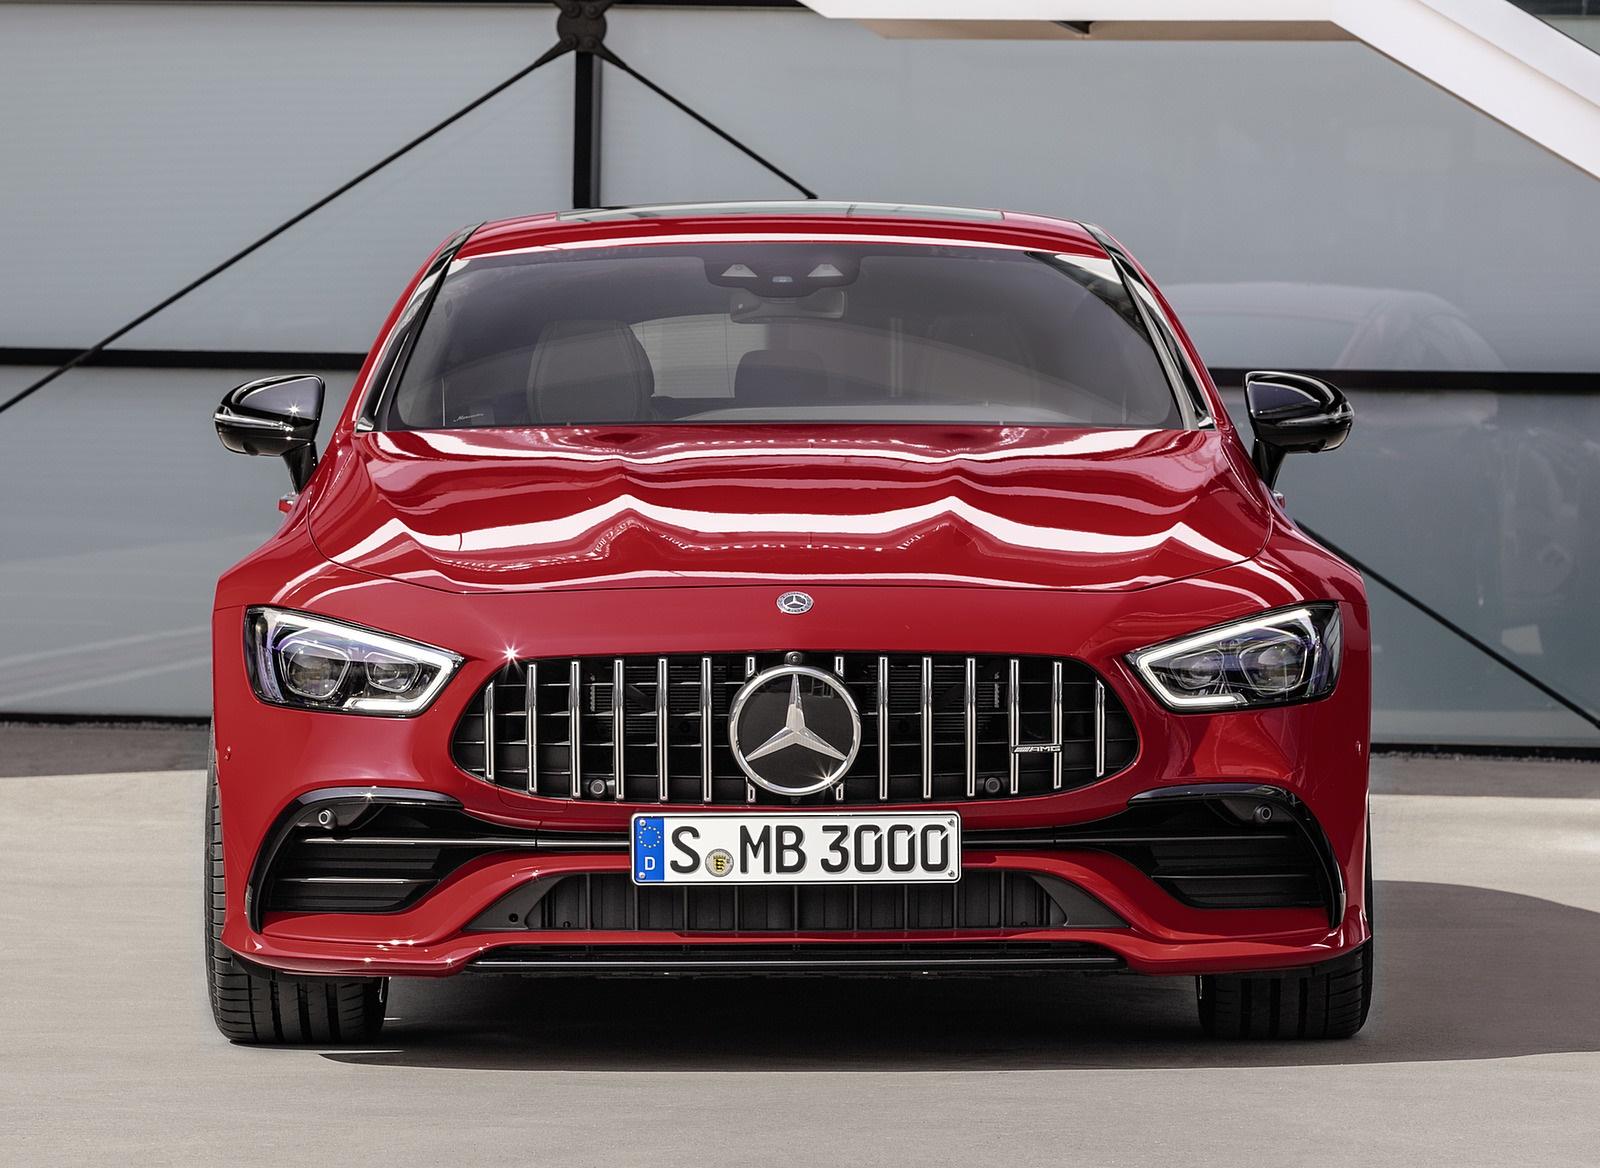 2019 Mercedes-AMG GT 43 4MATIC+ 4-Door Coupé (Color: Jupiter Red) Front Wallpapers (6)